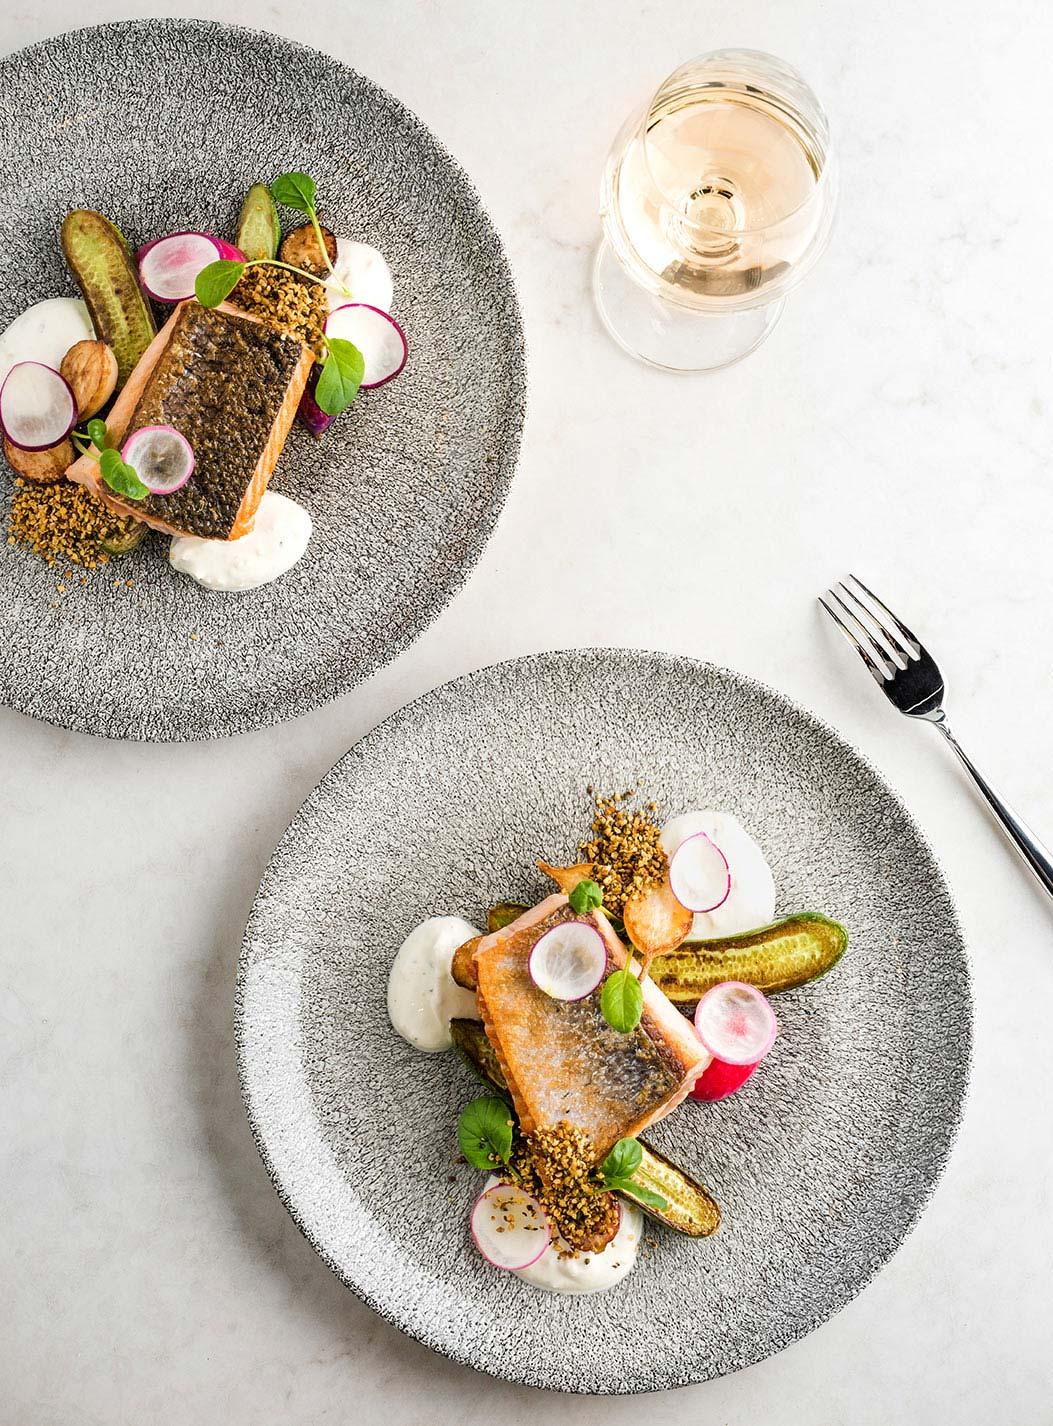 L'îlot restaurant - Bien manger